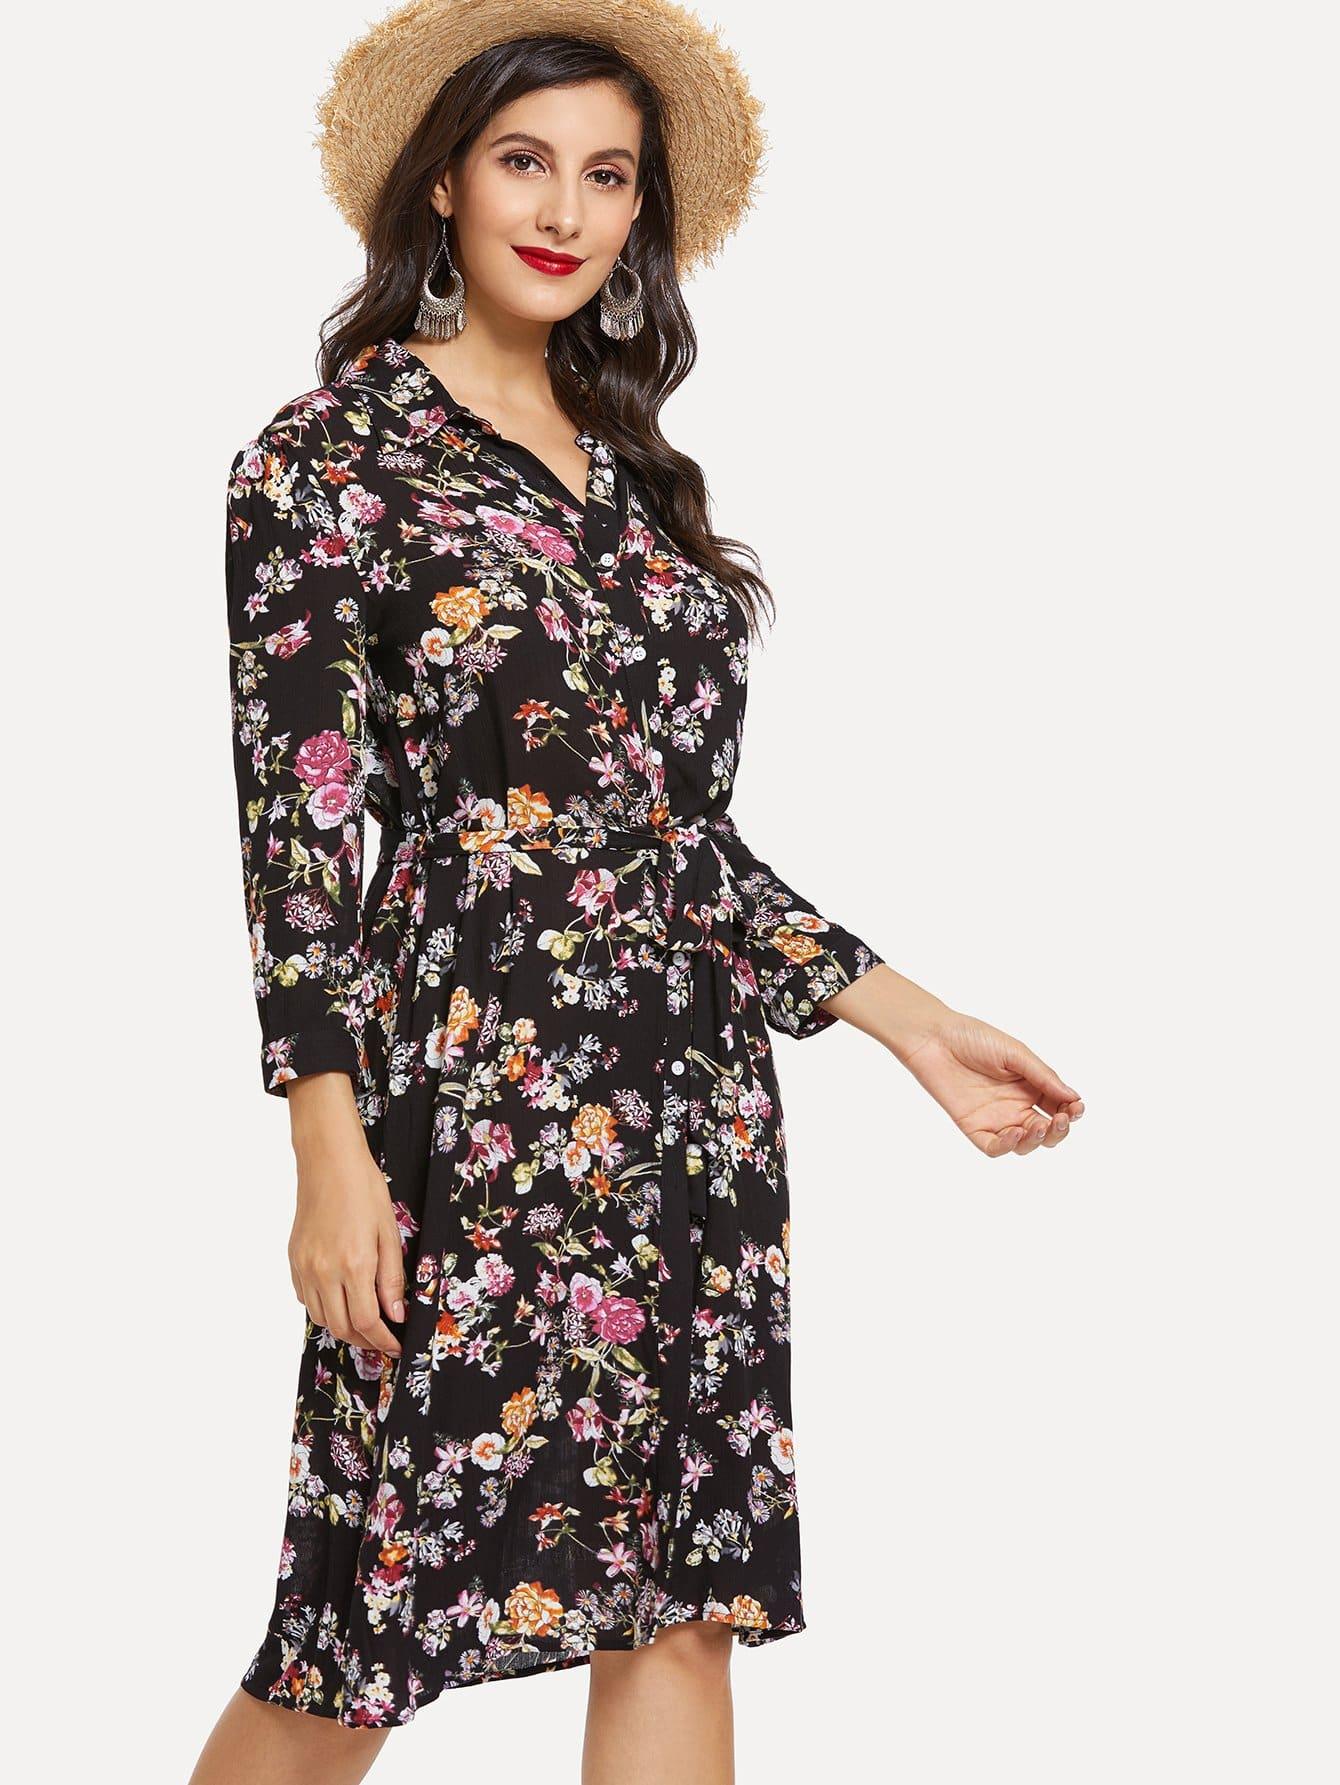 Allover Flower Print Tie Neck Dress